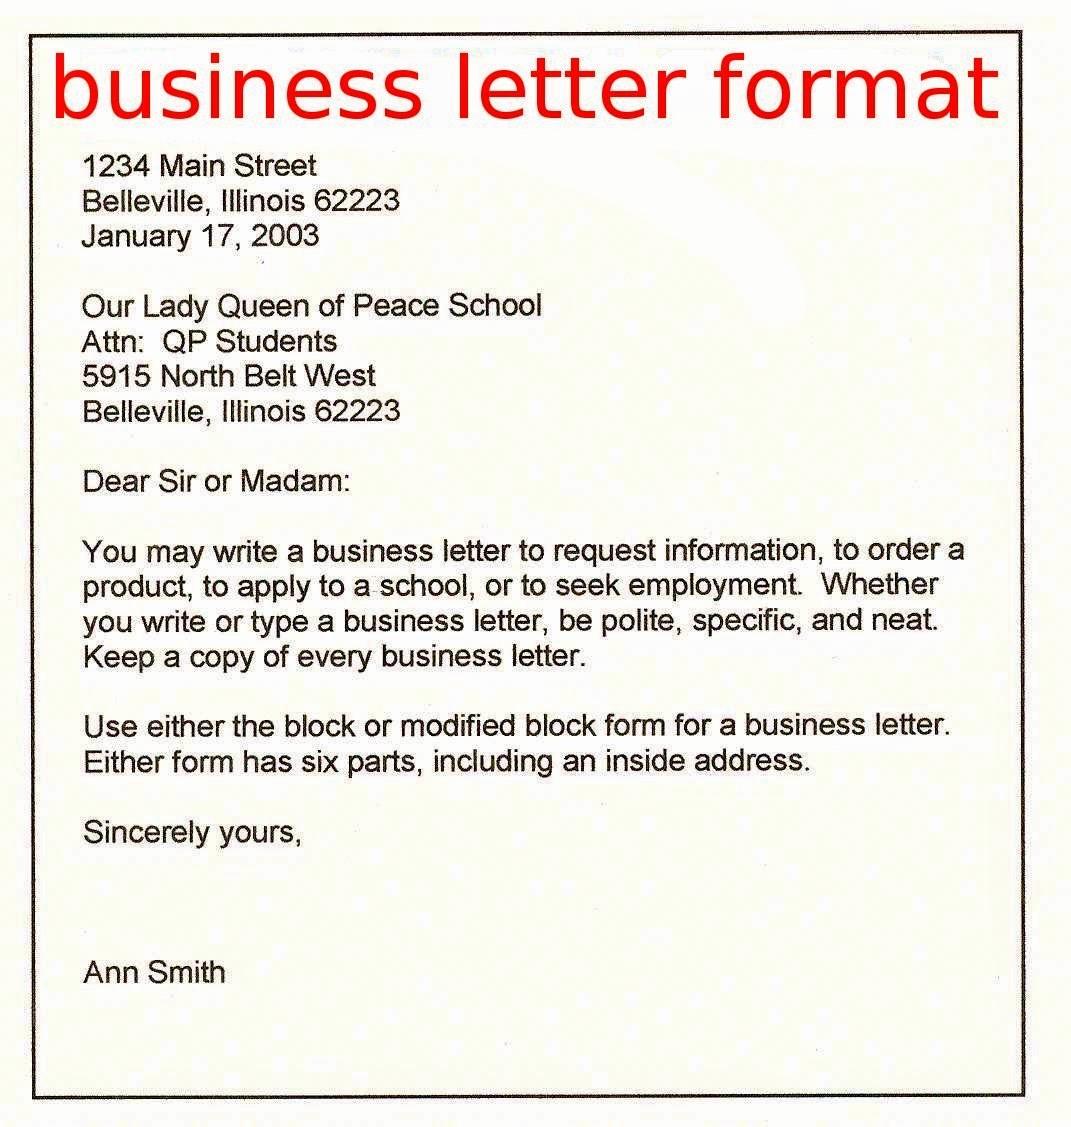 Format for formal Business Letter Lovely April 2015 Samples Business Letters